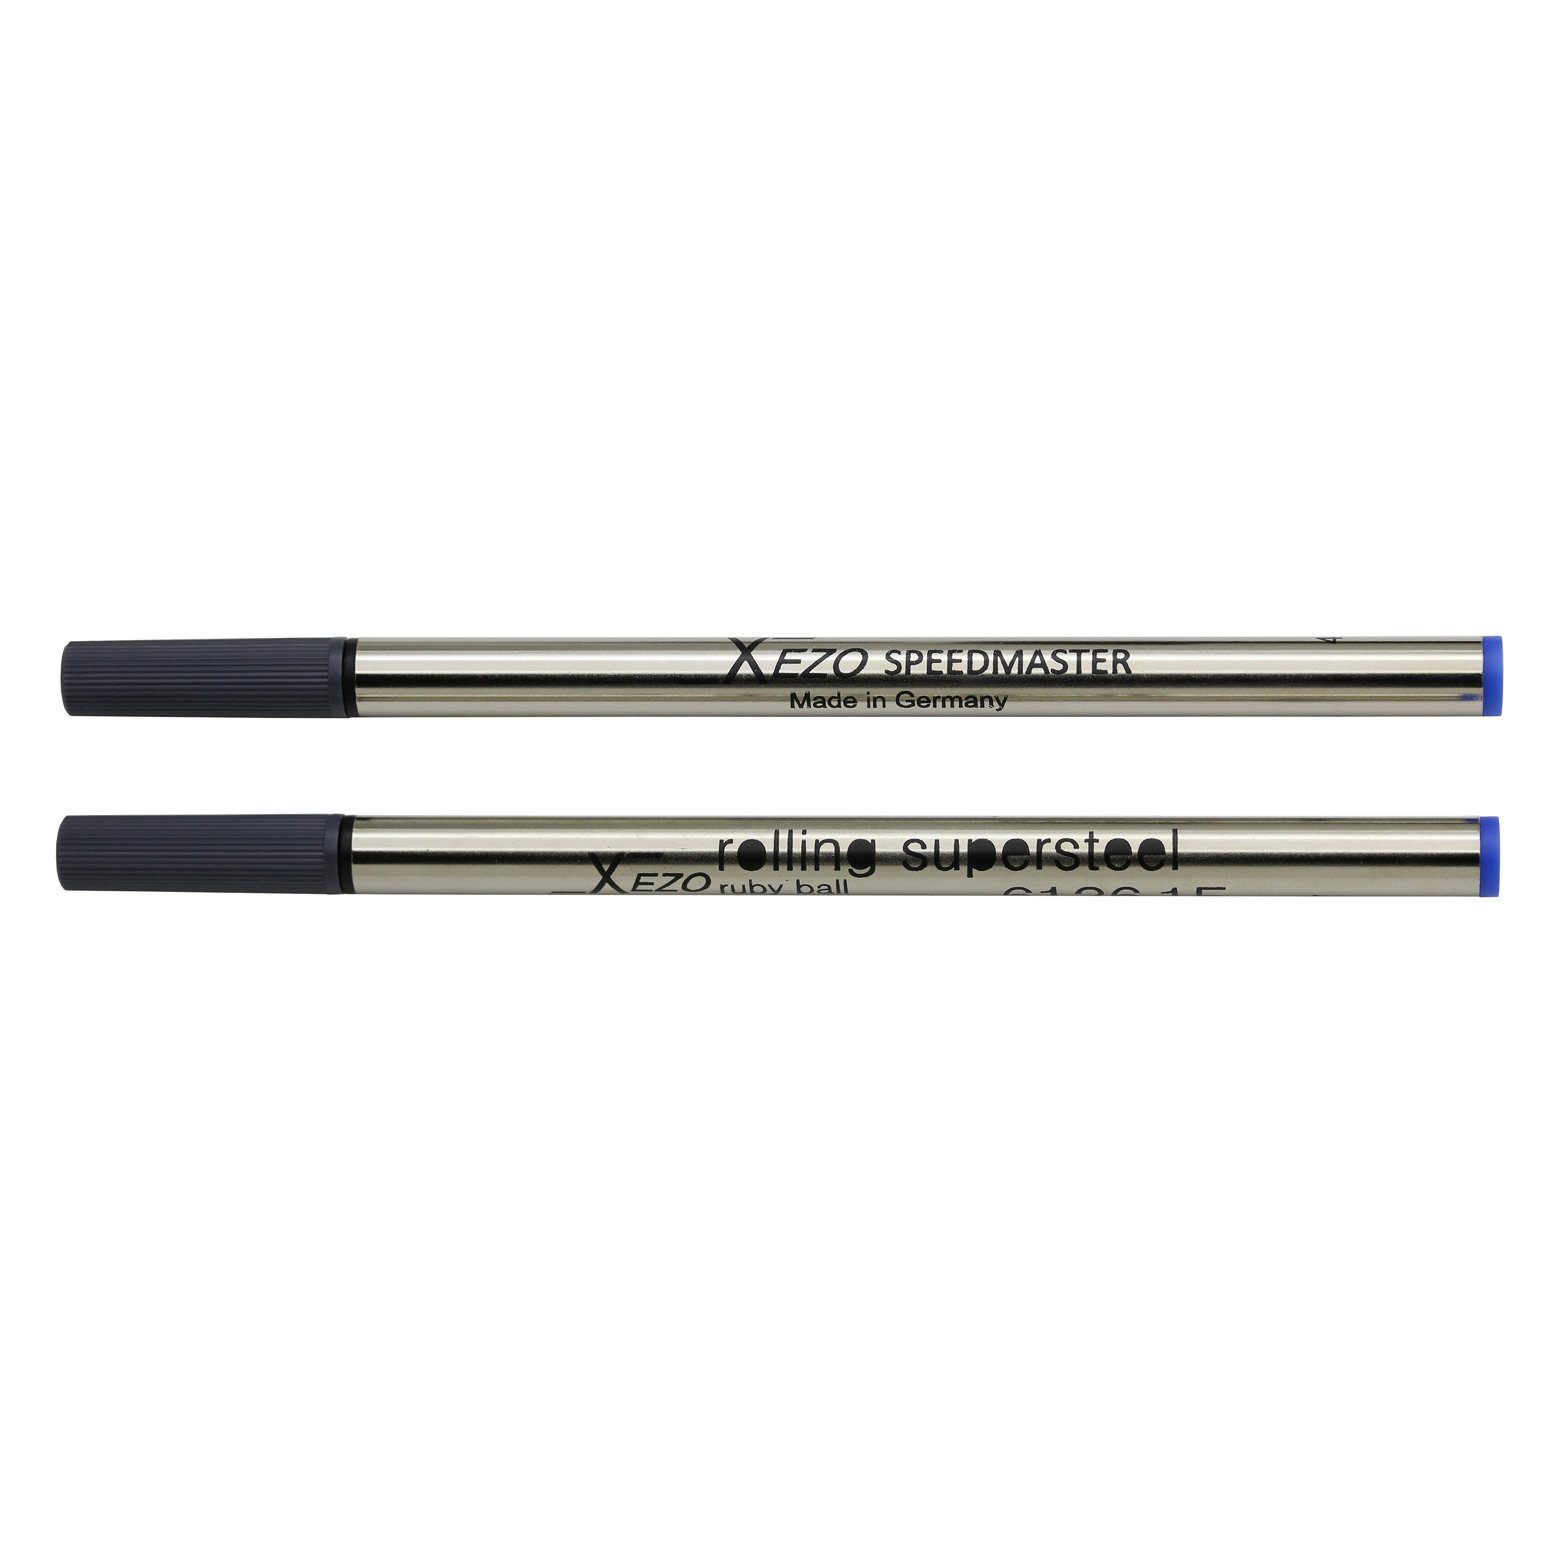 Xezo Pens Speedmaster Fine Rollerball Refills, Pack of 2,...